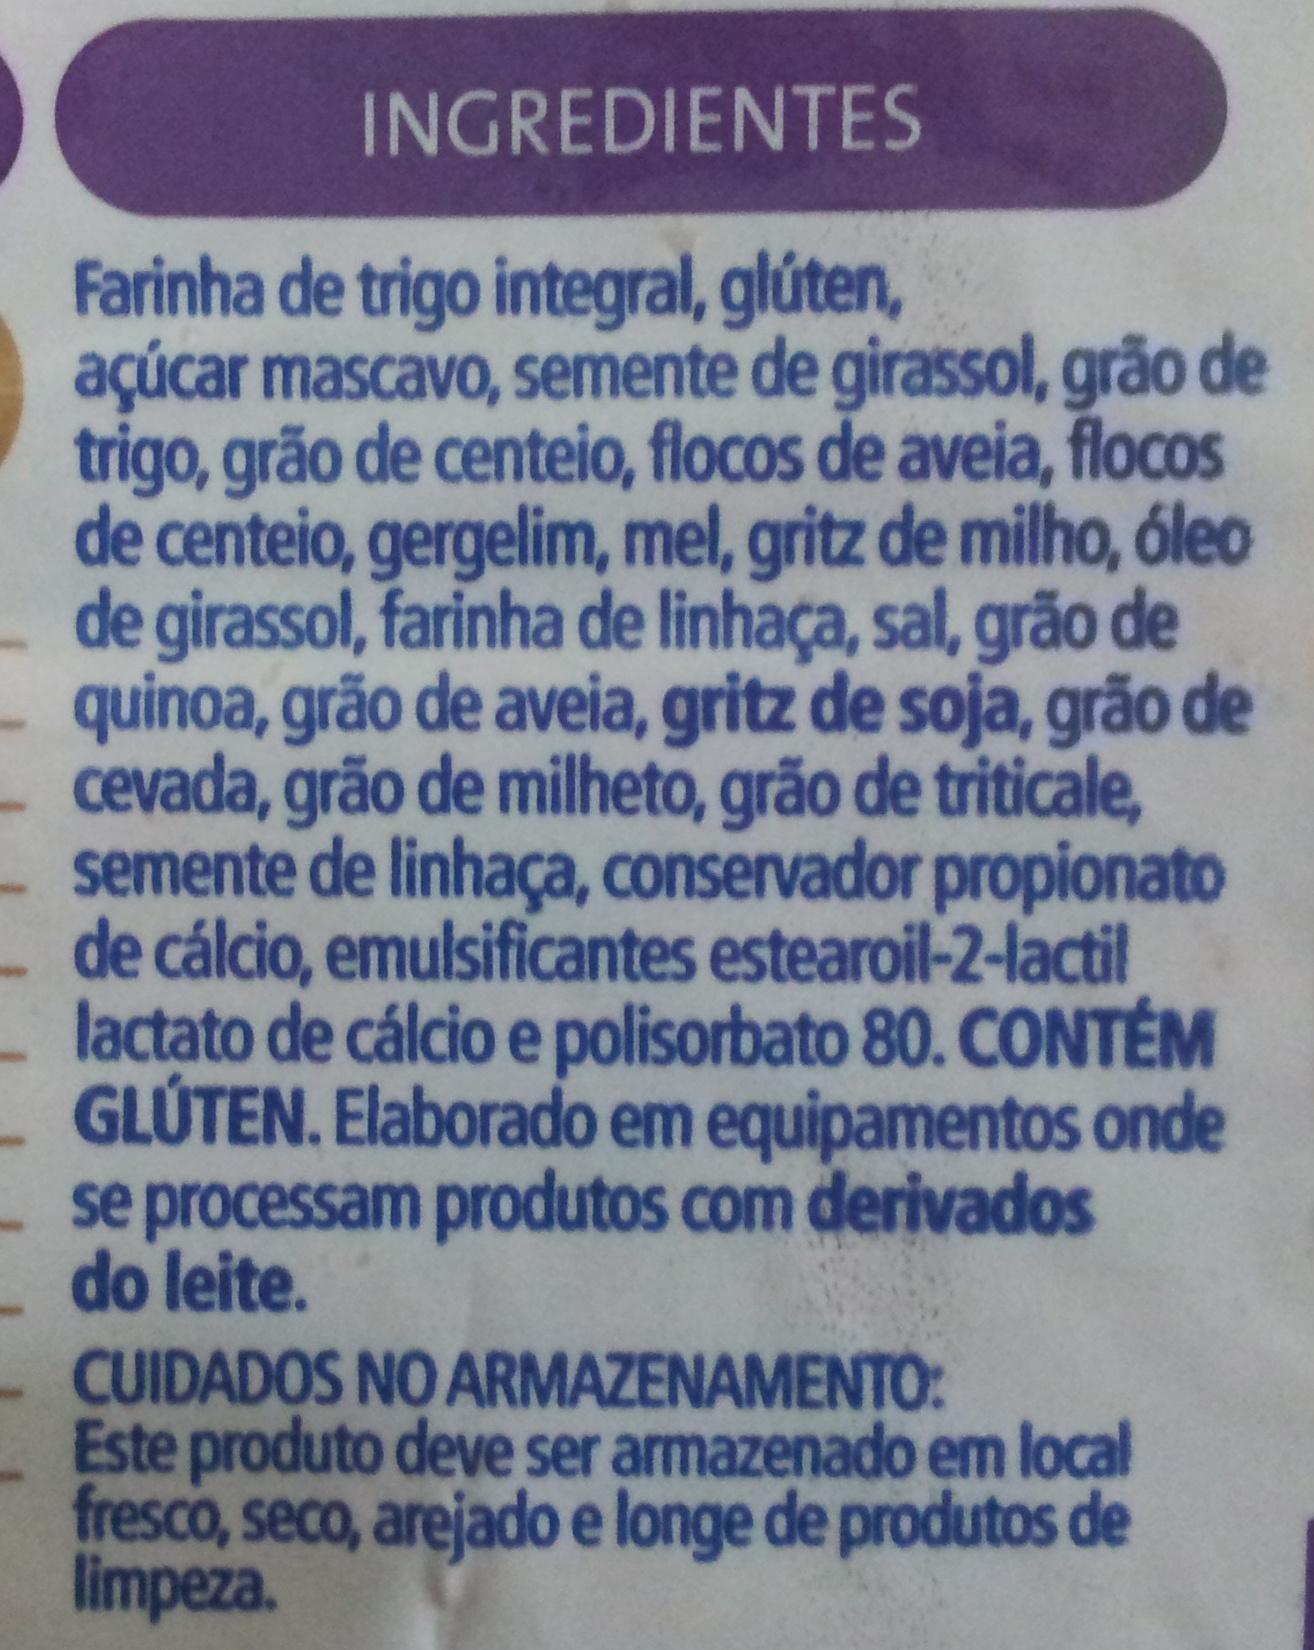 Pullman Integral 12 Grãos - Ingredients